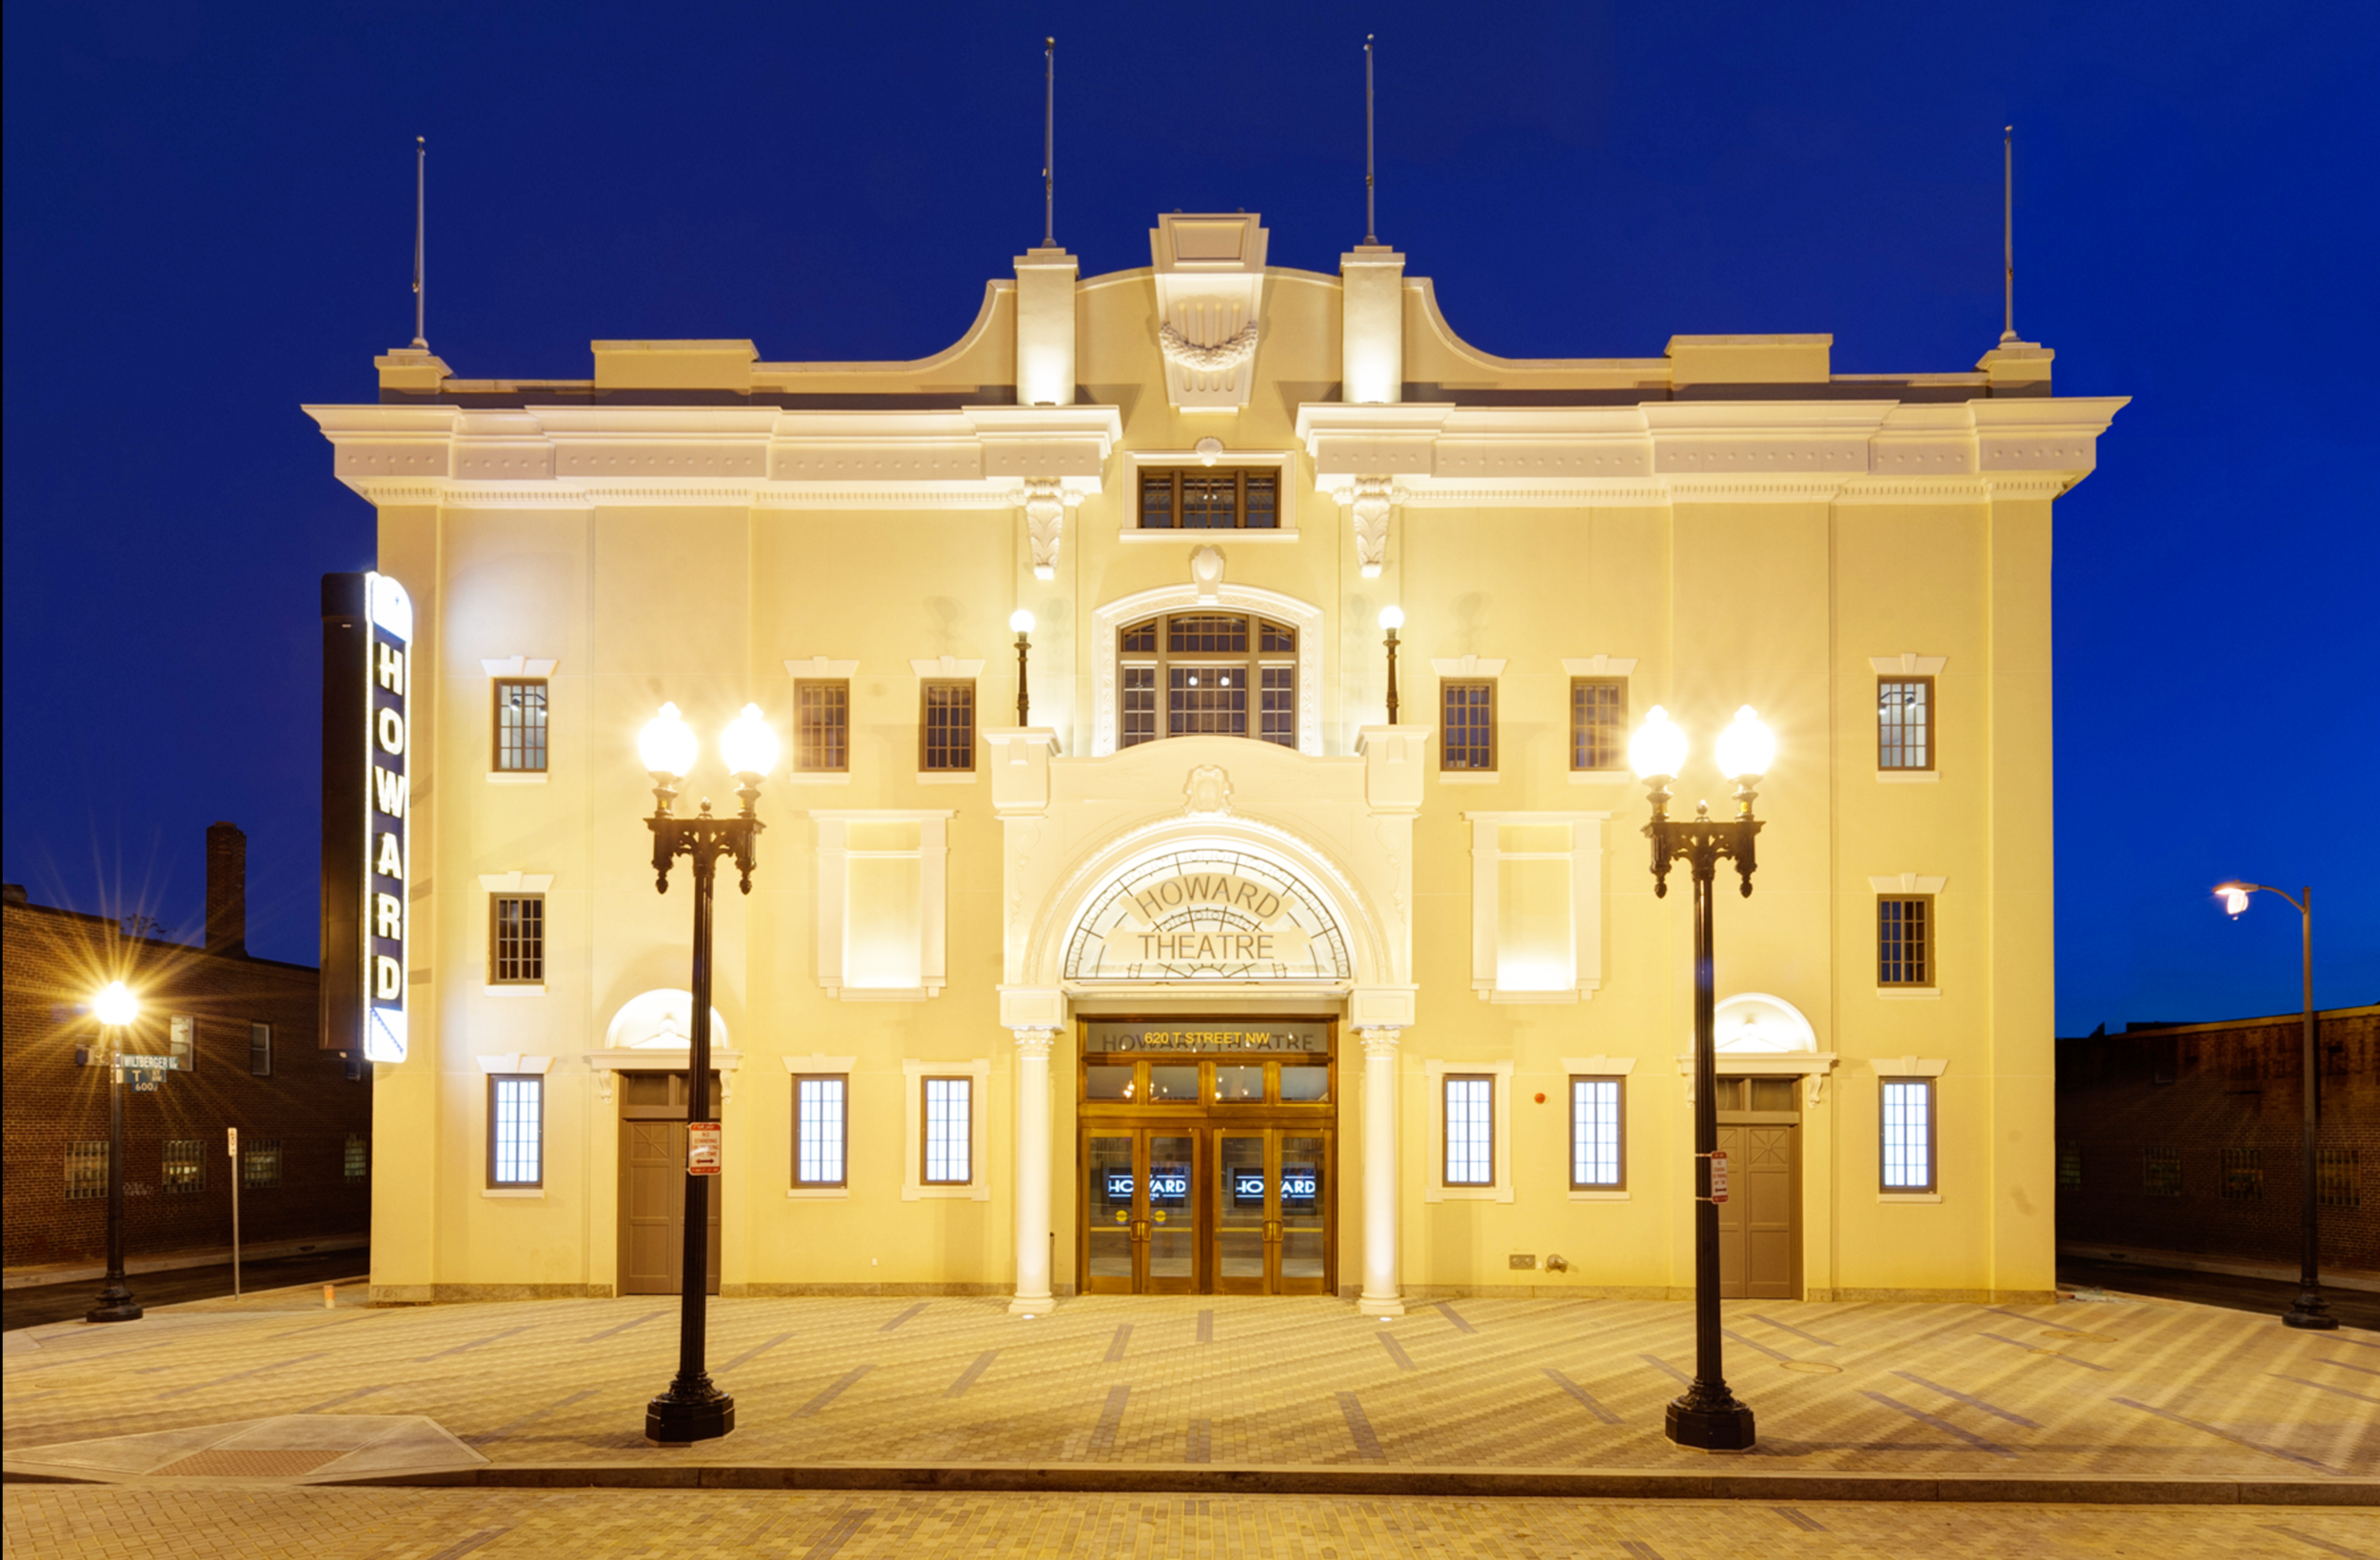 Historic Howard Theatre